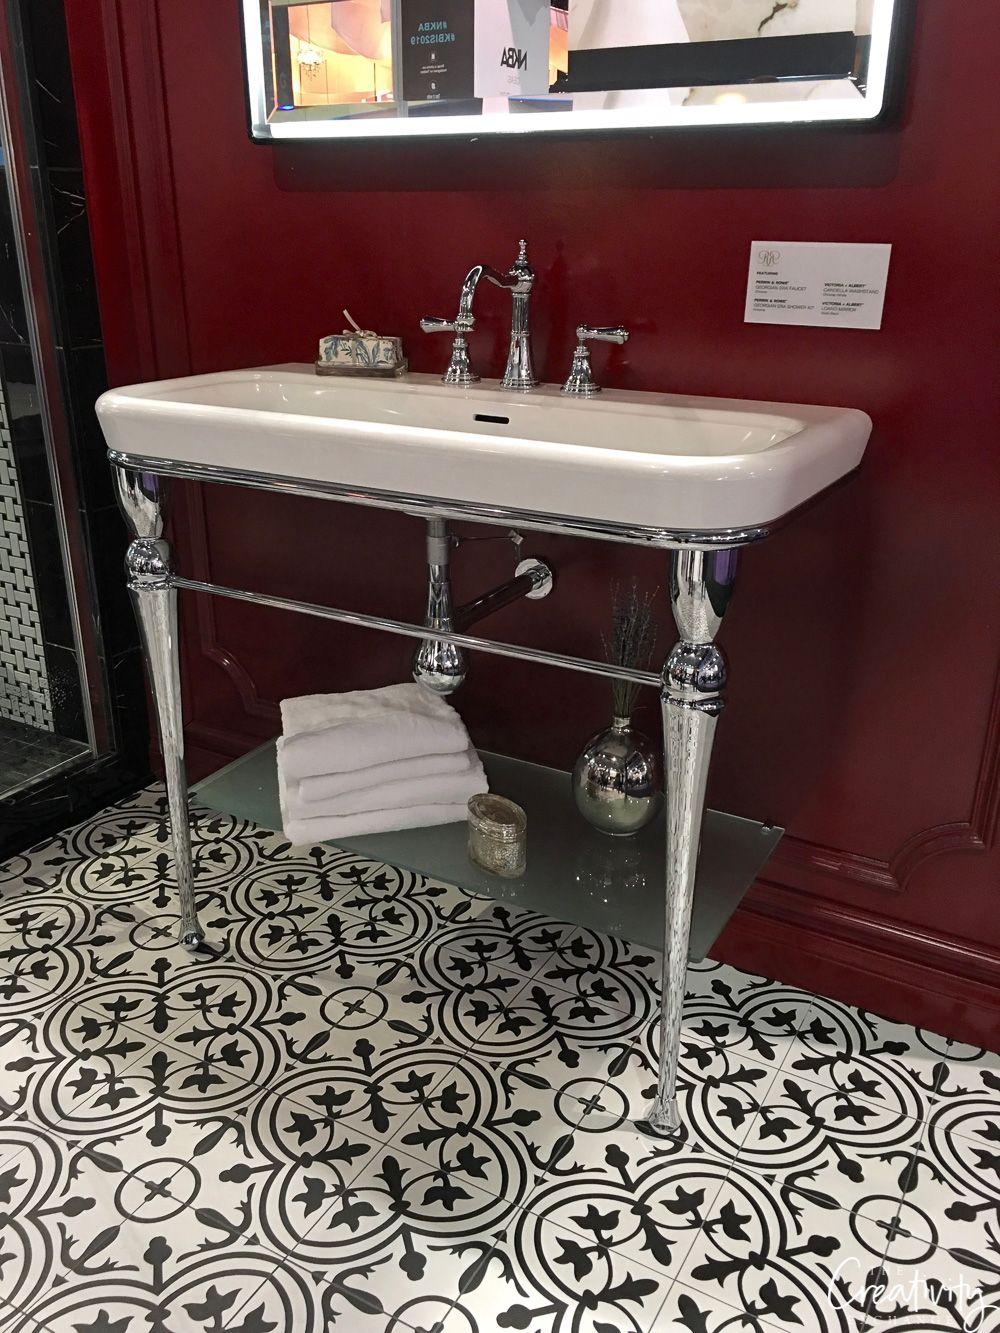 2019 Kitchen And Bath Industry Show In Las Vegas Sink Black Bathroom Bathroom Vanity